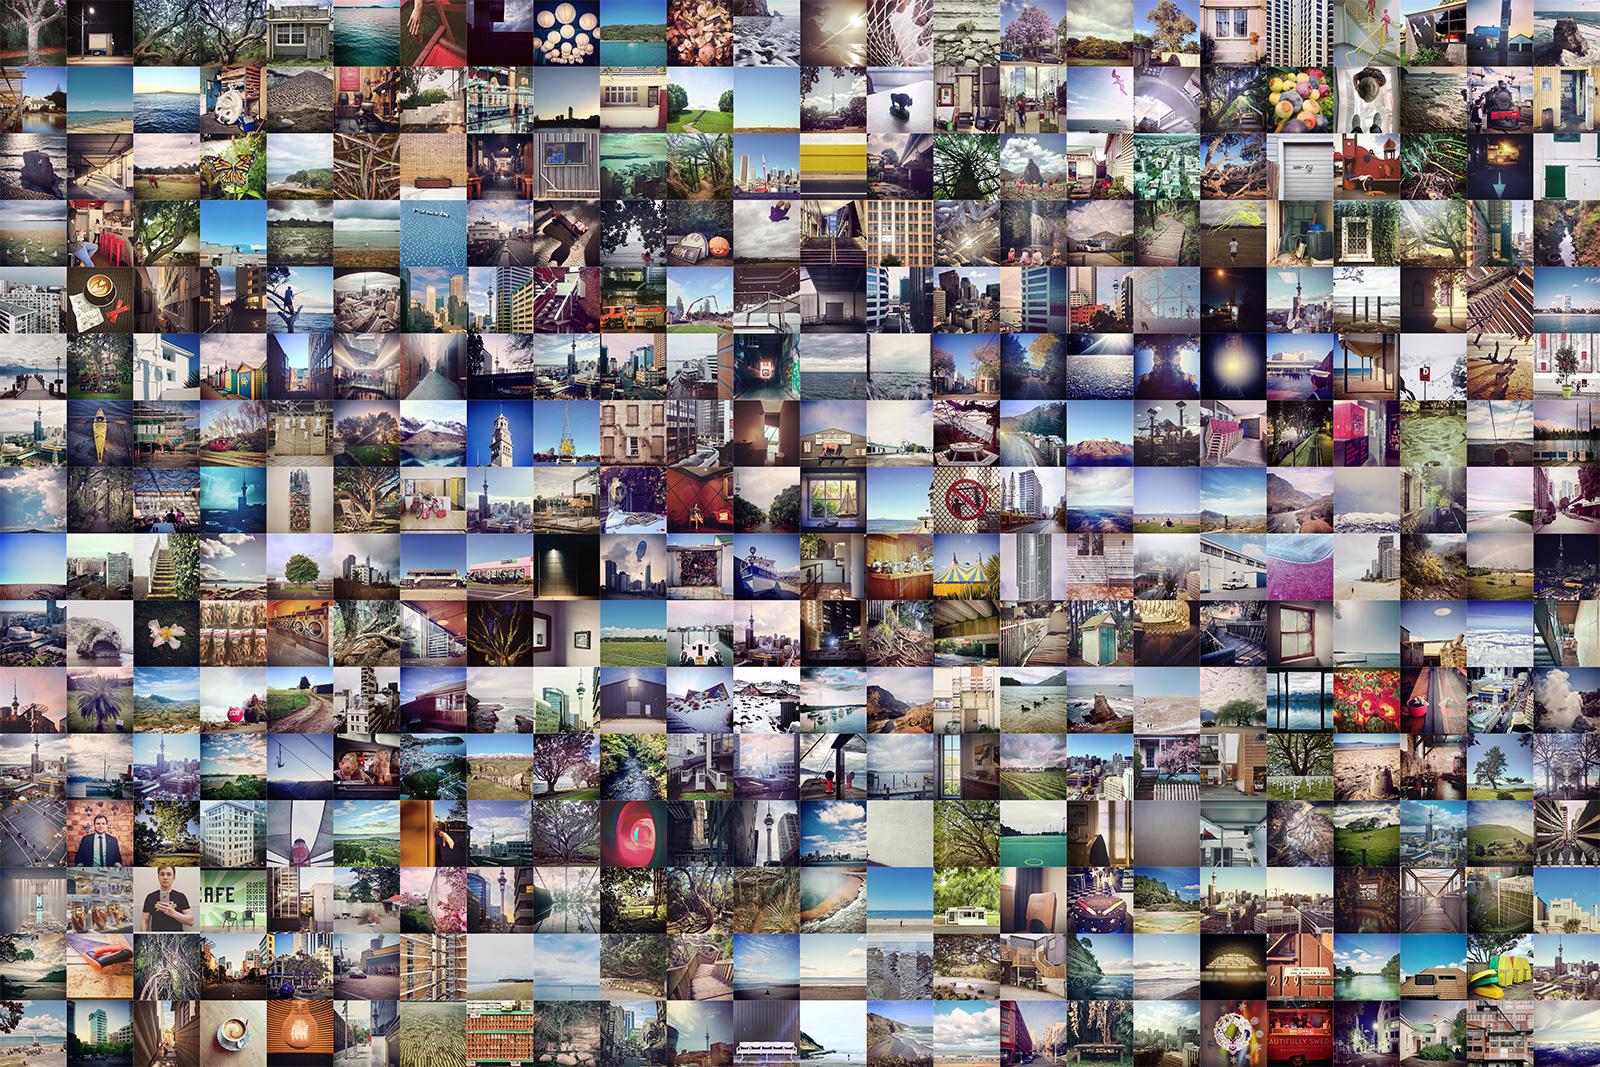 2015-instagram-pano-1600